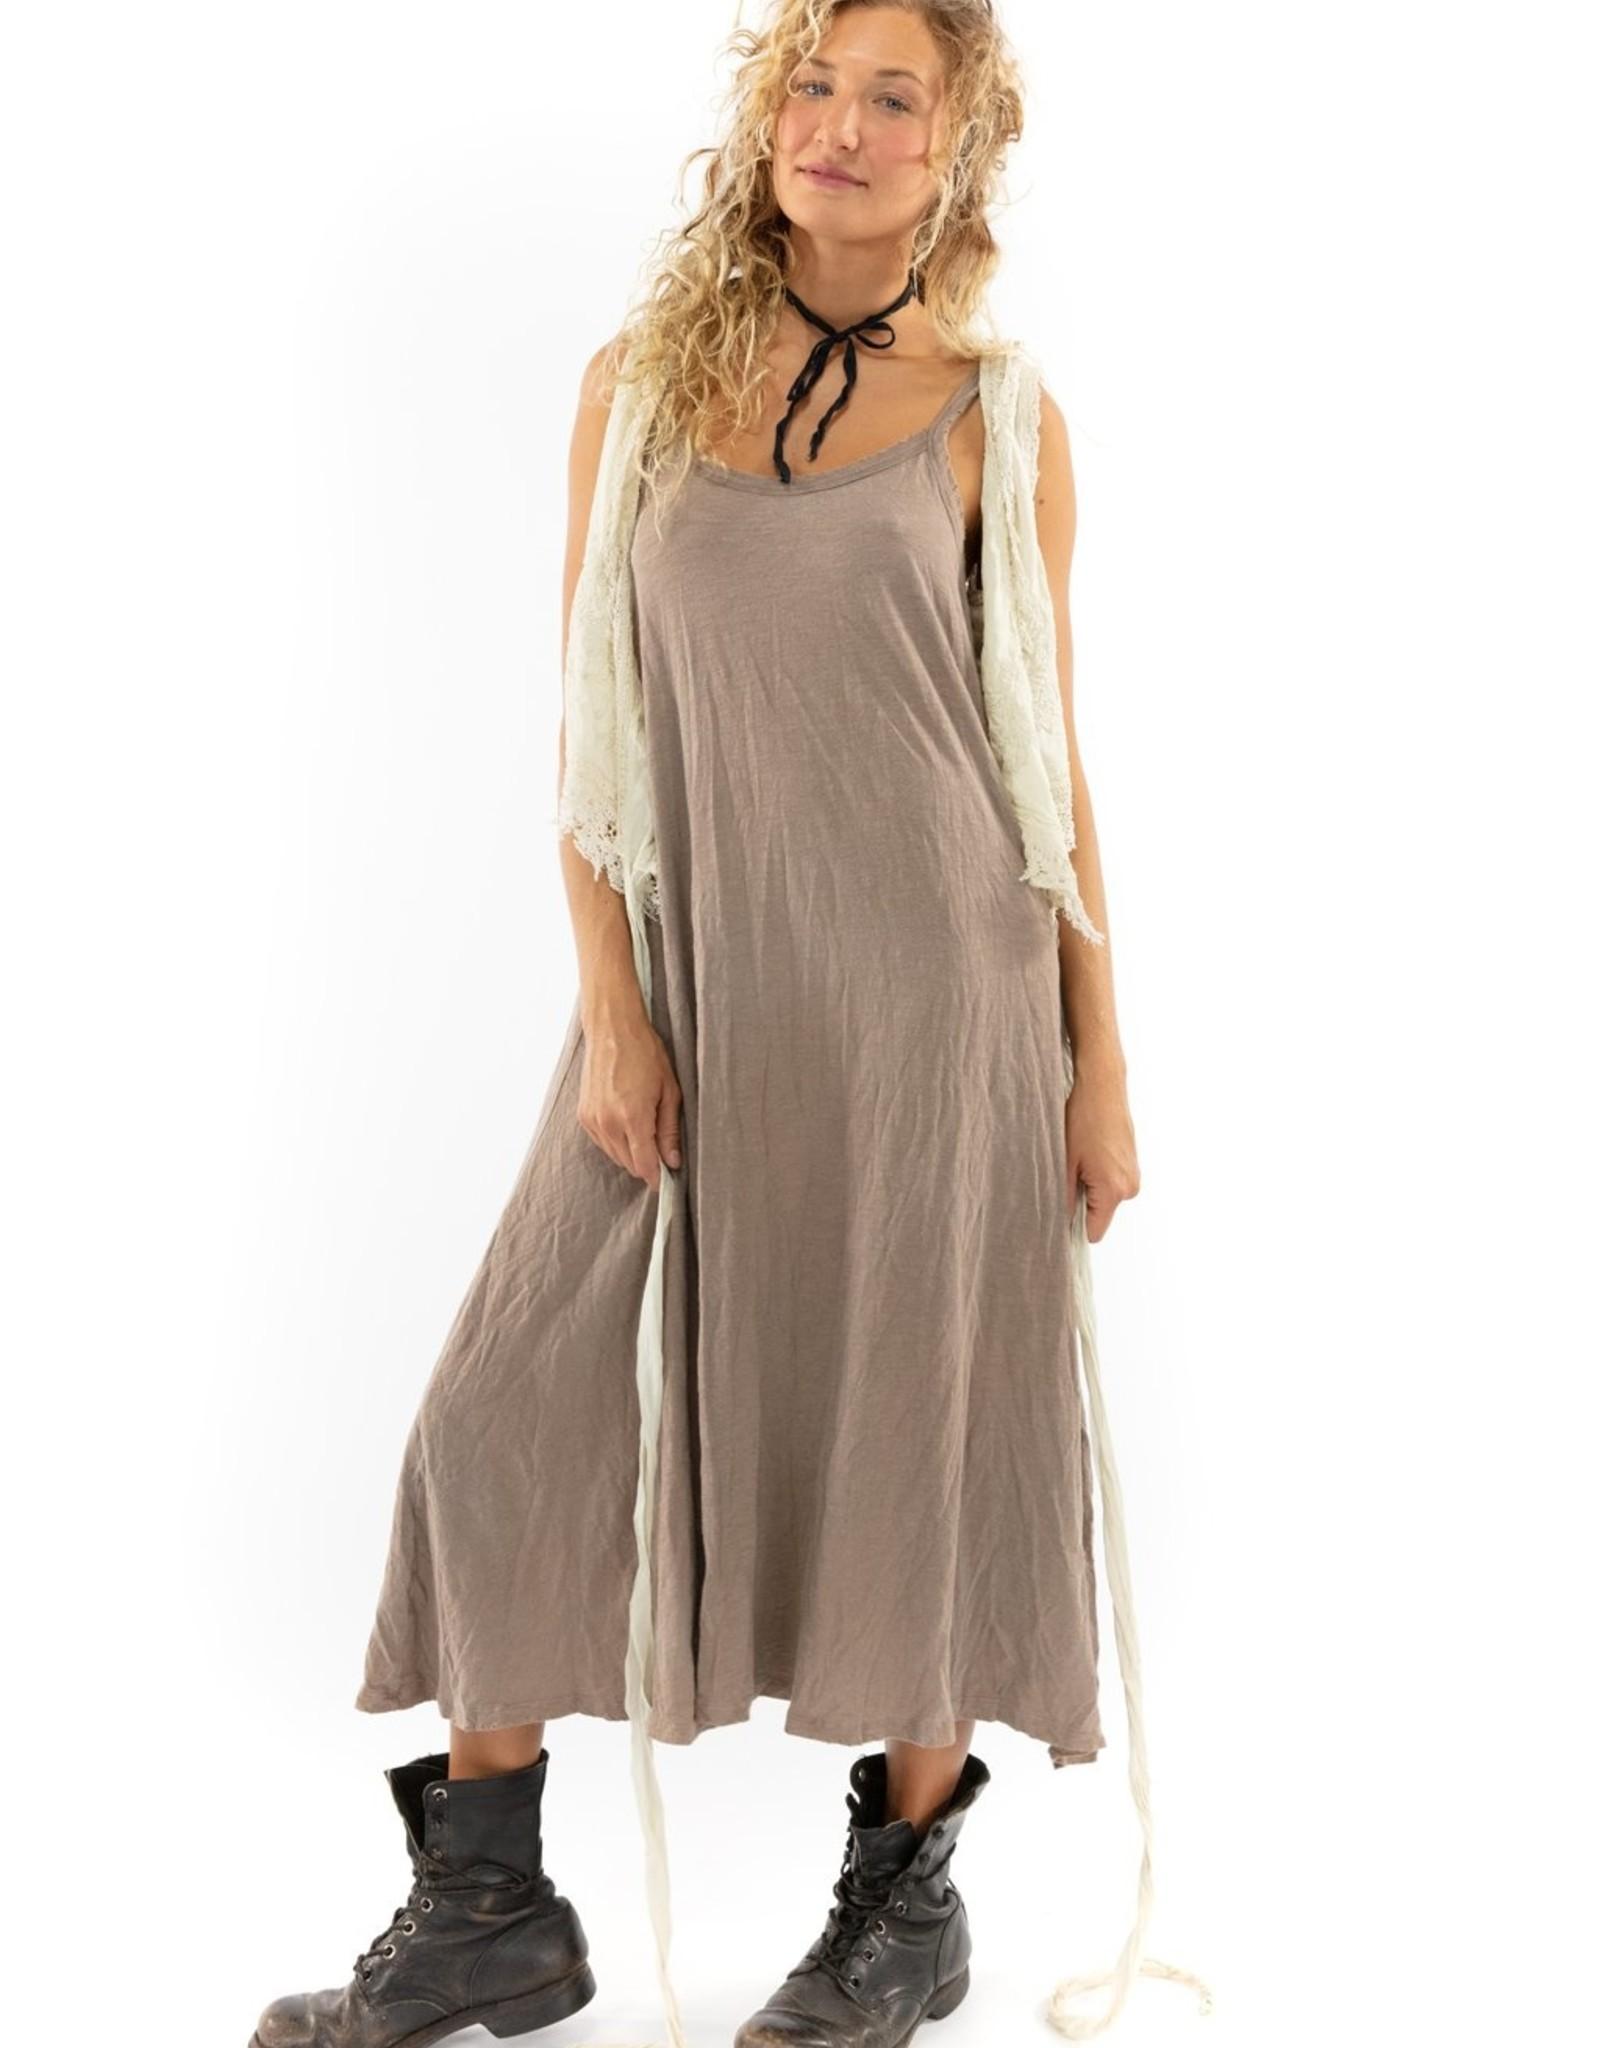 MAGNOLIA PEARL Lana Tank Dress